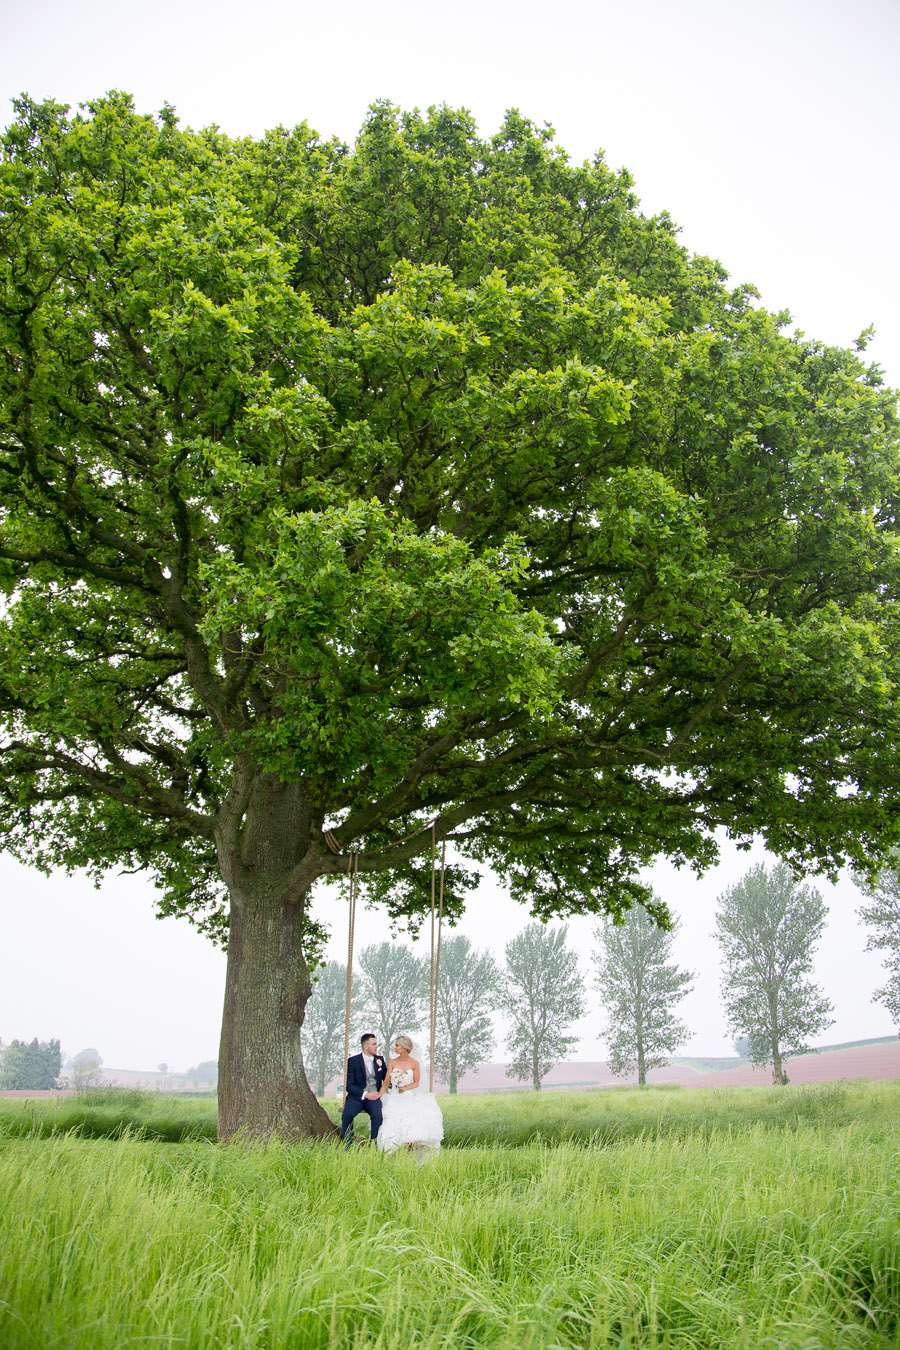 Quantock Lakes wedding styling ideas real wedding photographer Martin Dabek on the English Wedding Blog (22)